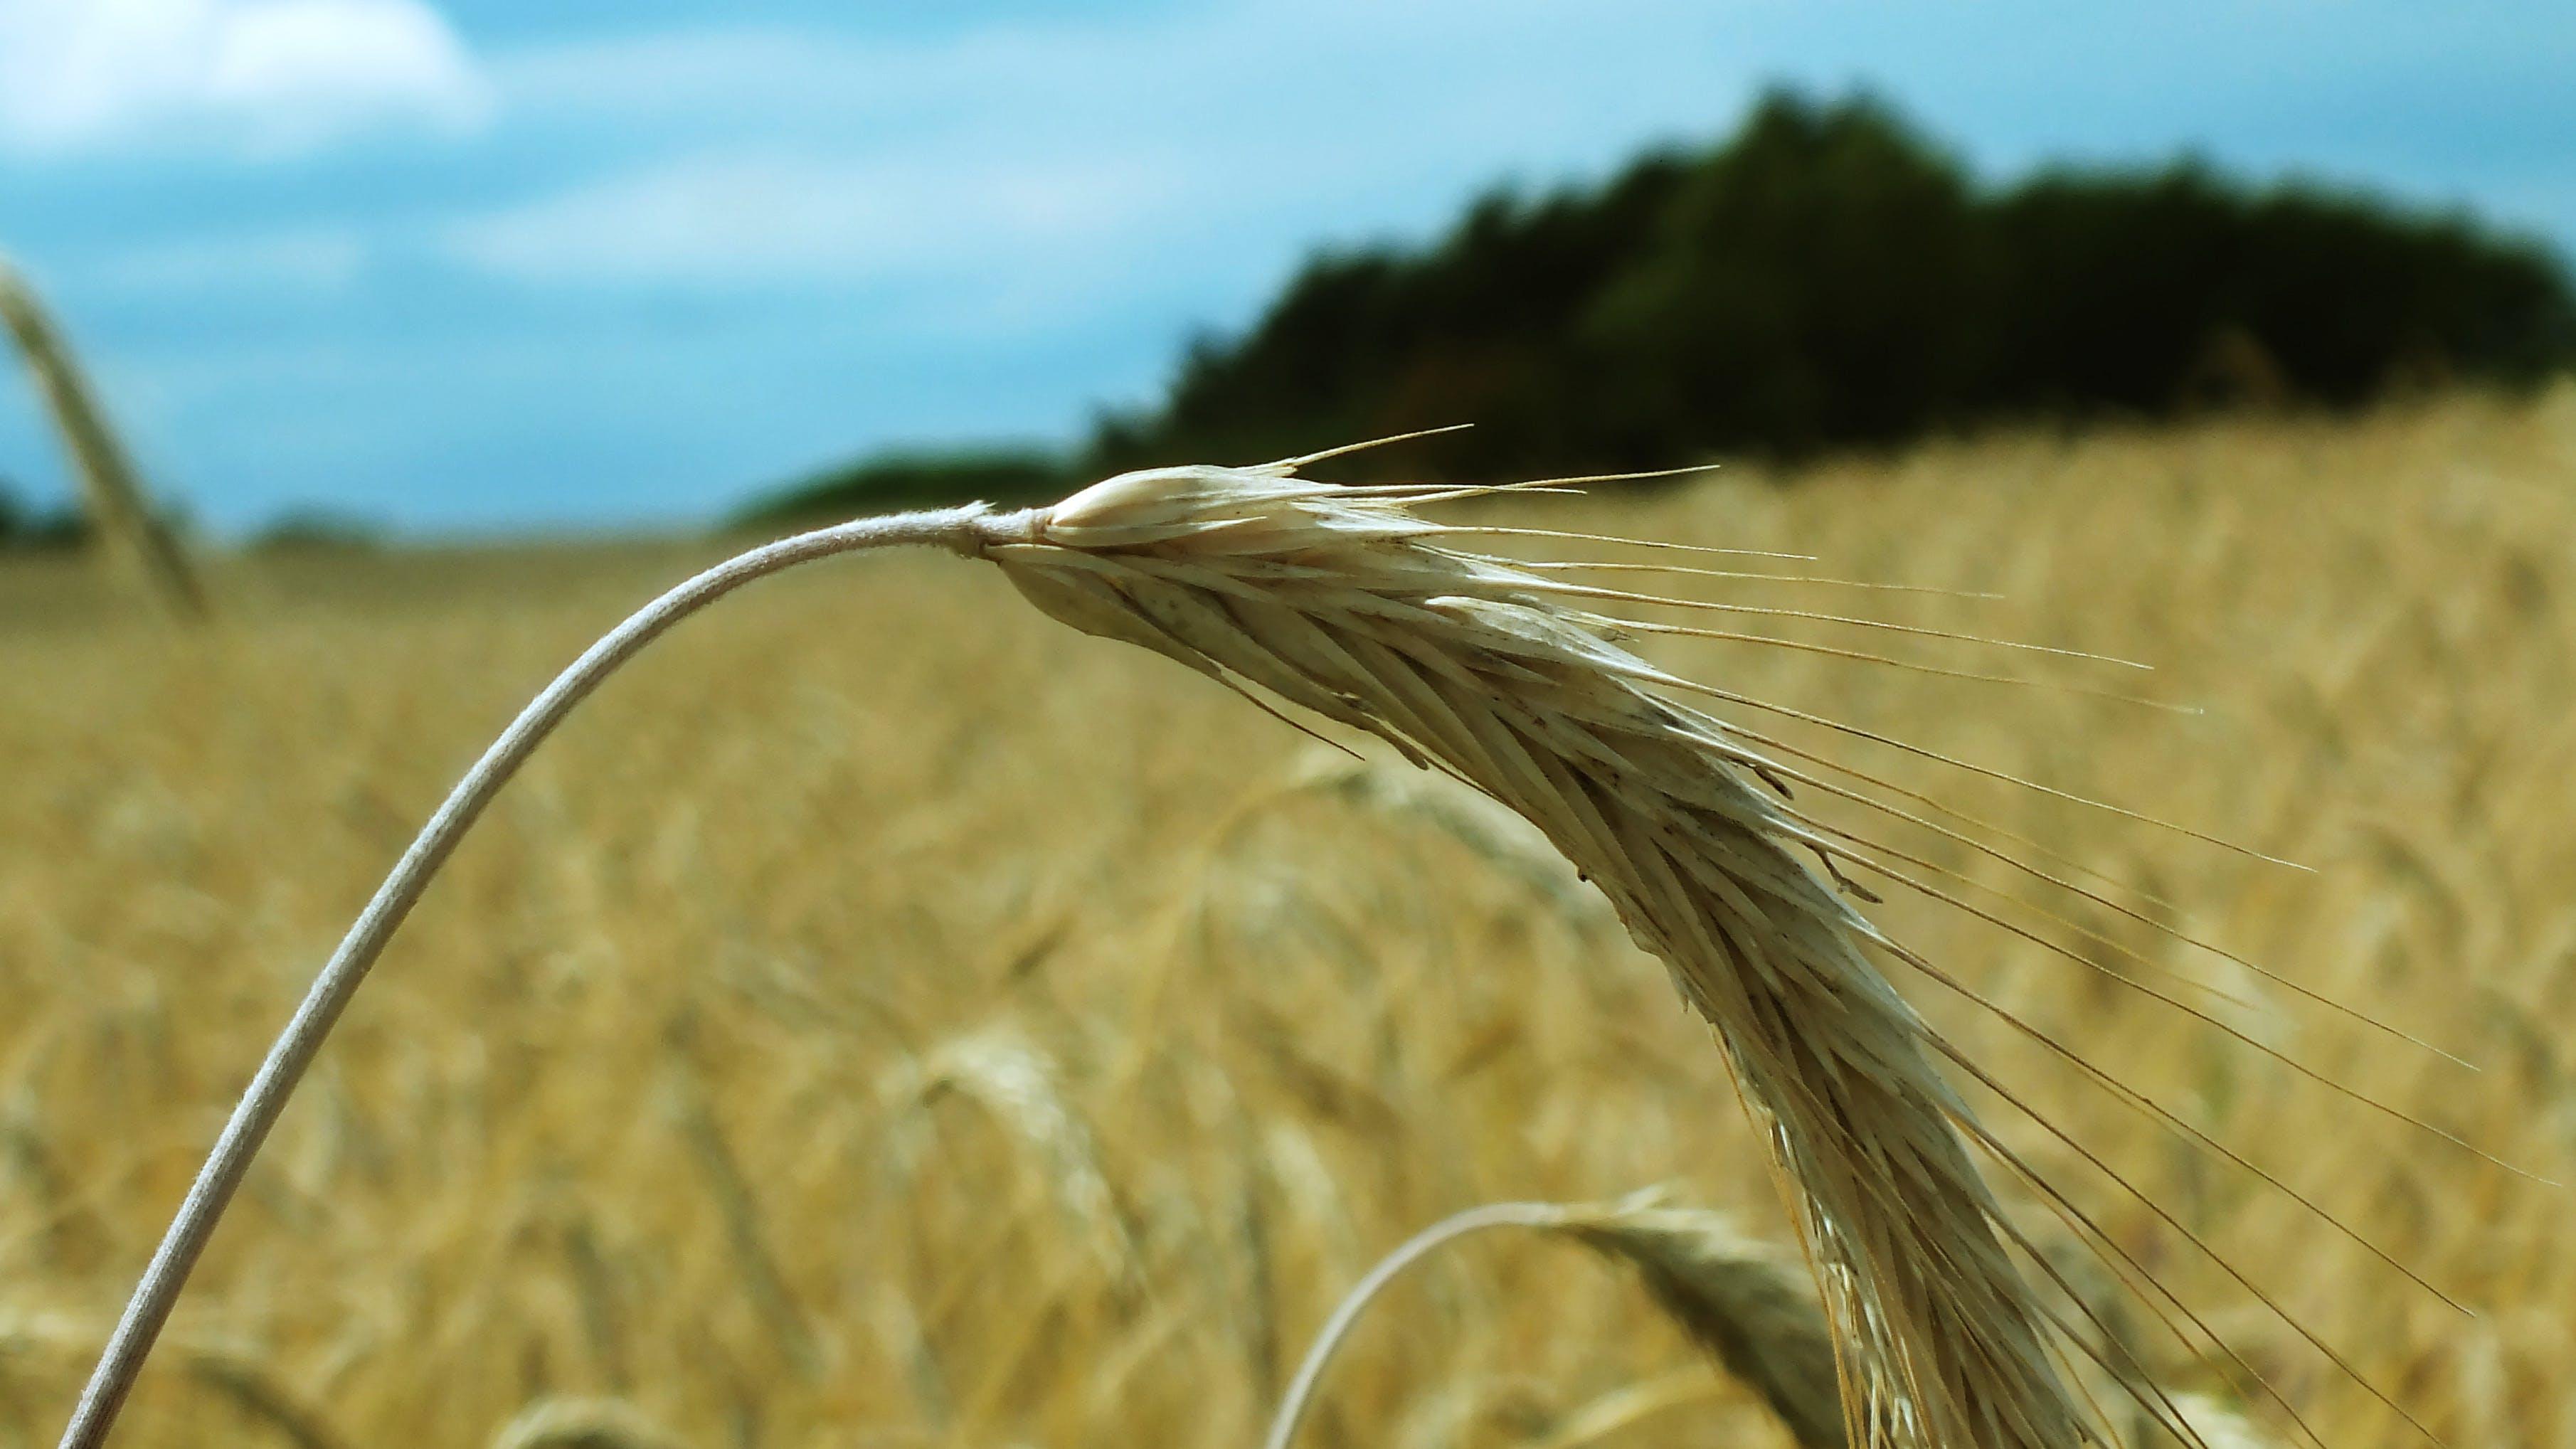 Free stock photo of nature, wheat field